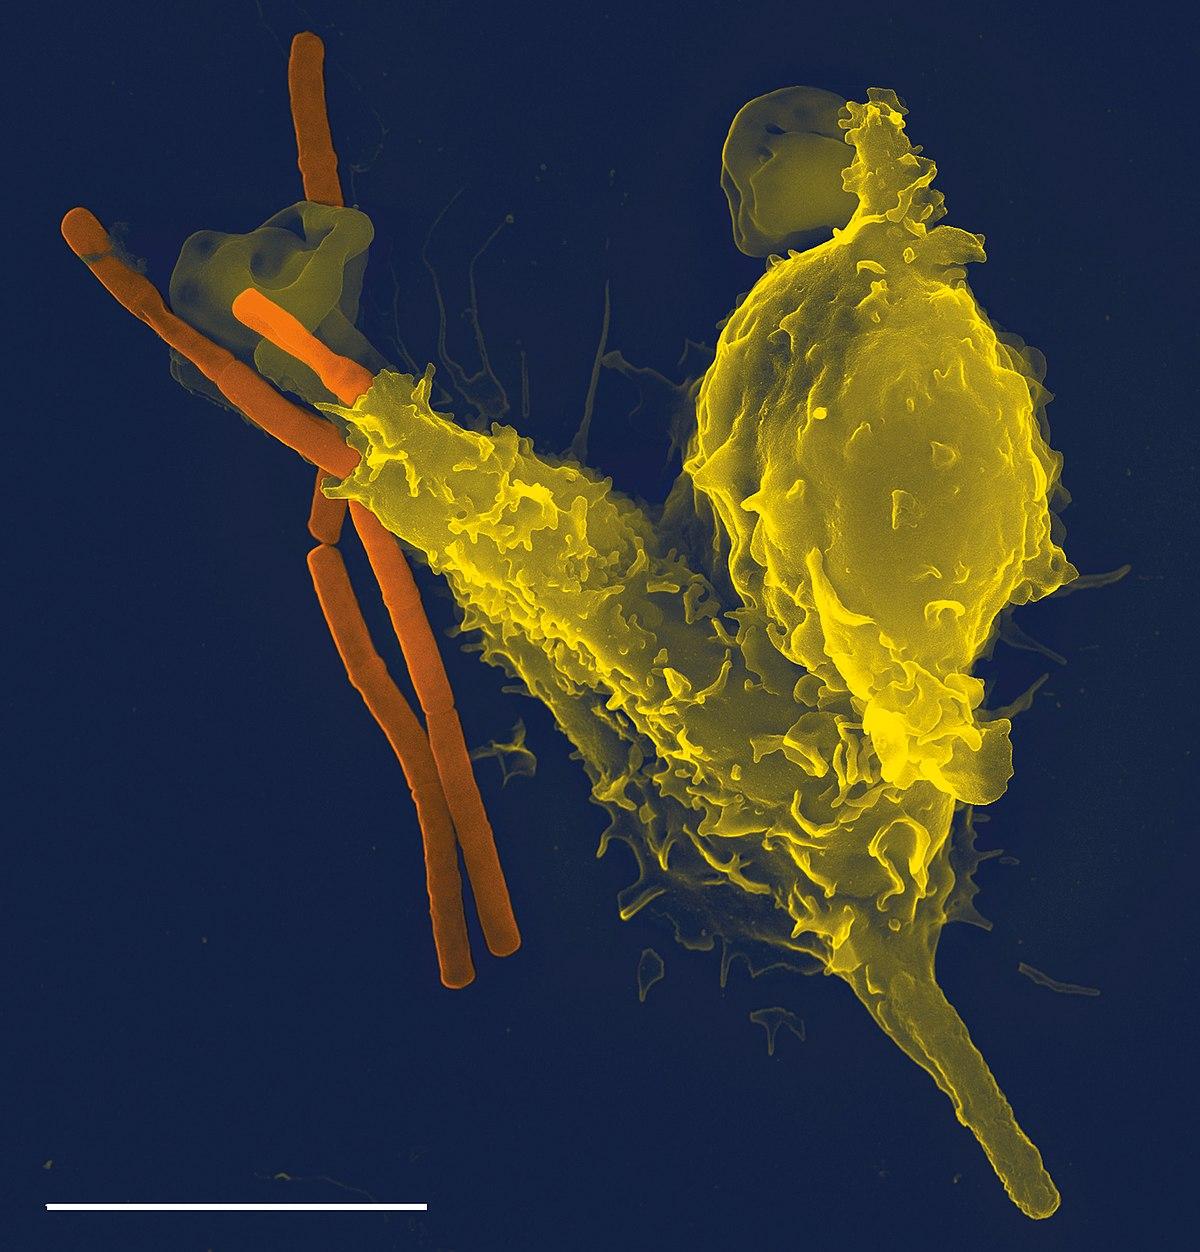 Immunrendszer Szarvasmarha lánc antitestek